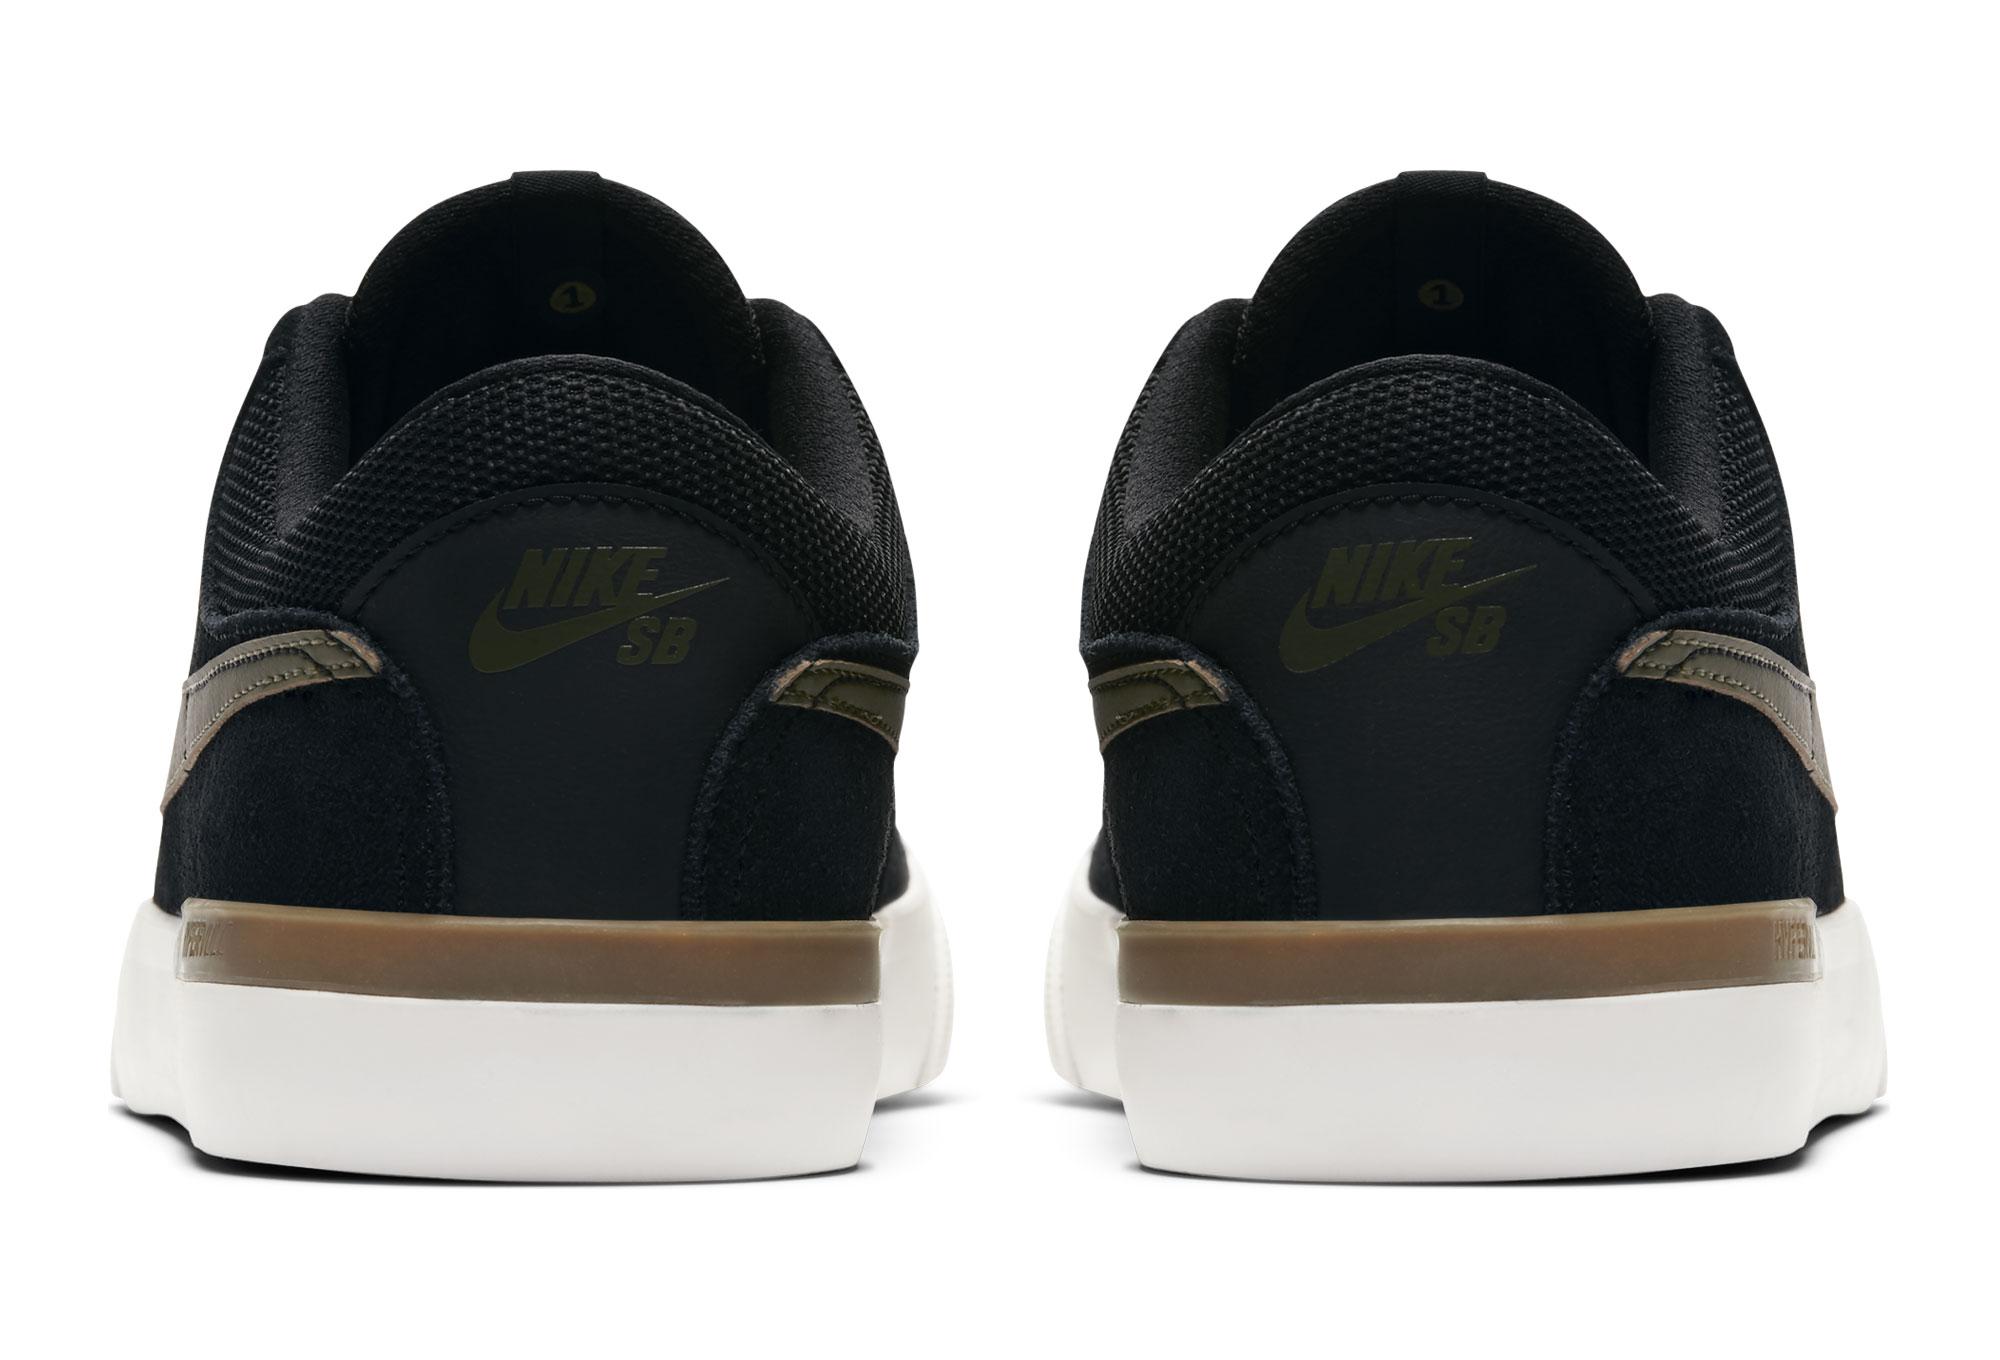 finest selection 798cd 940e5 Nike SB Hypervulc Eric Koston Shoes Black Green